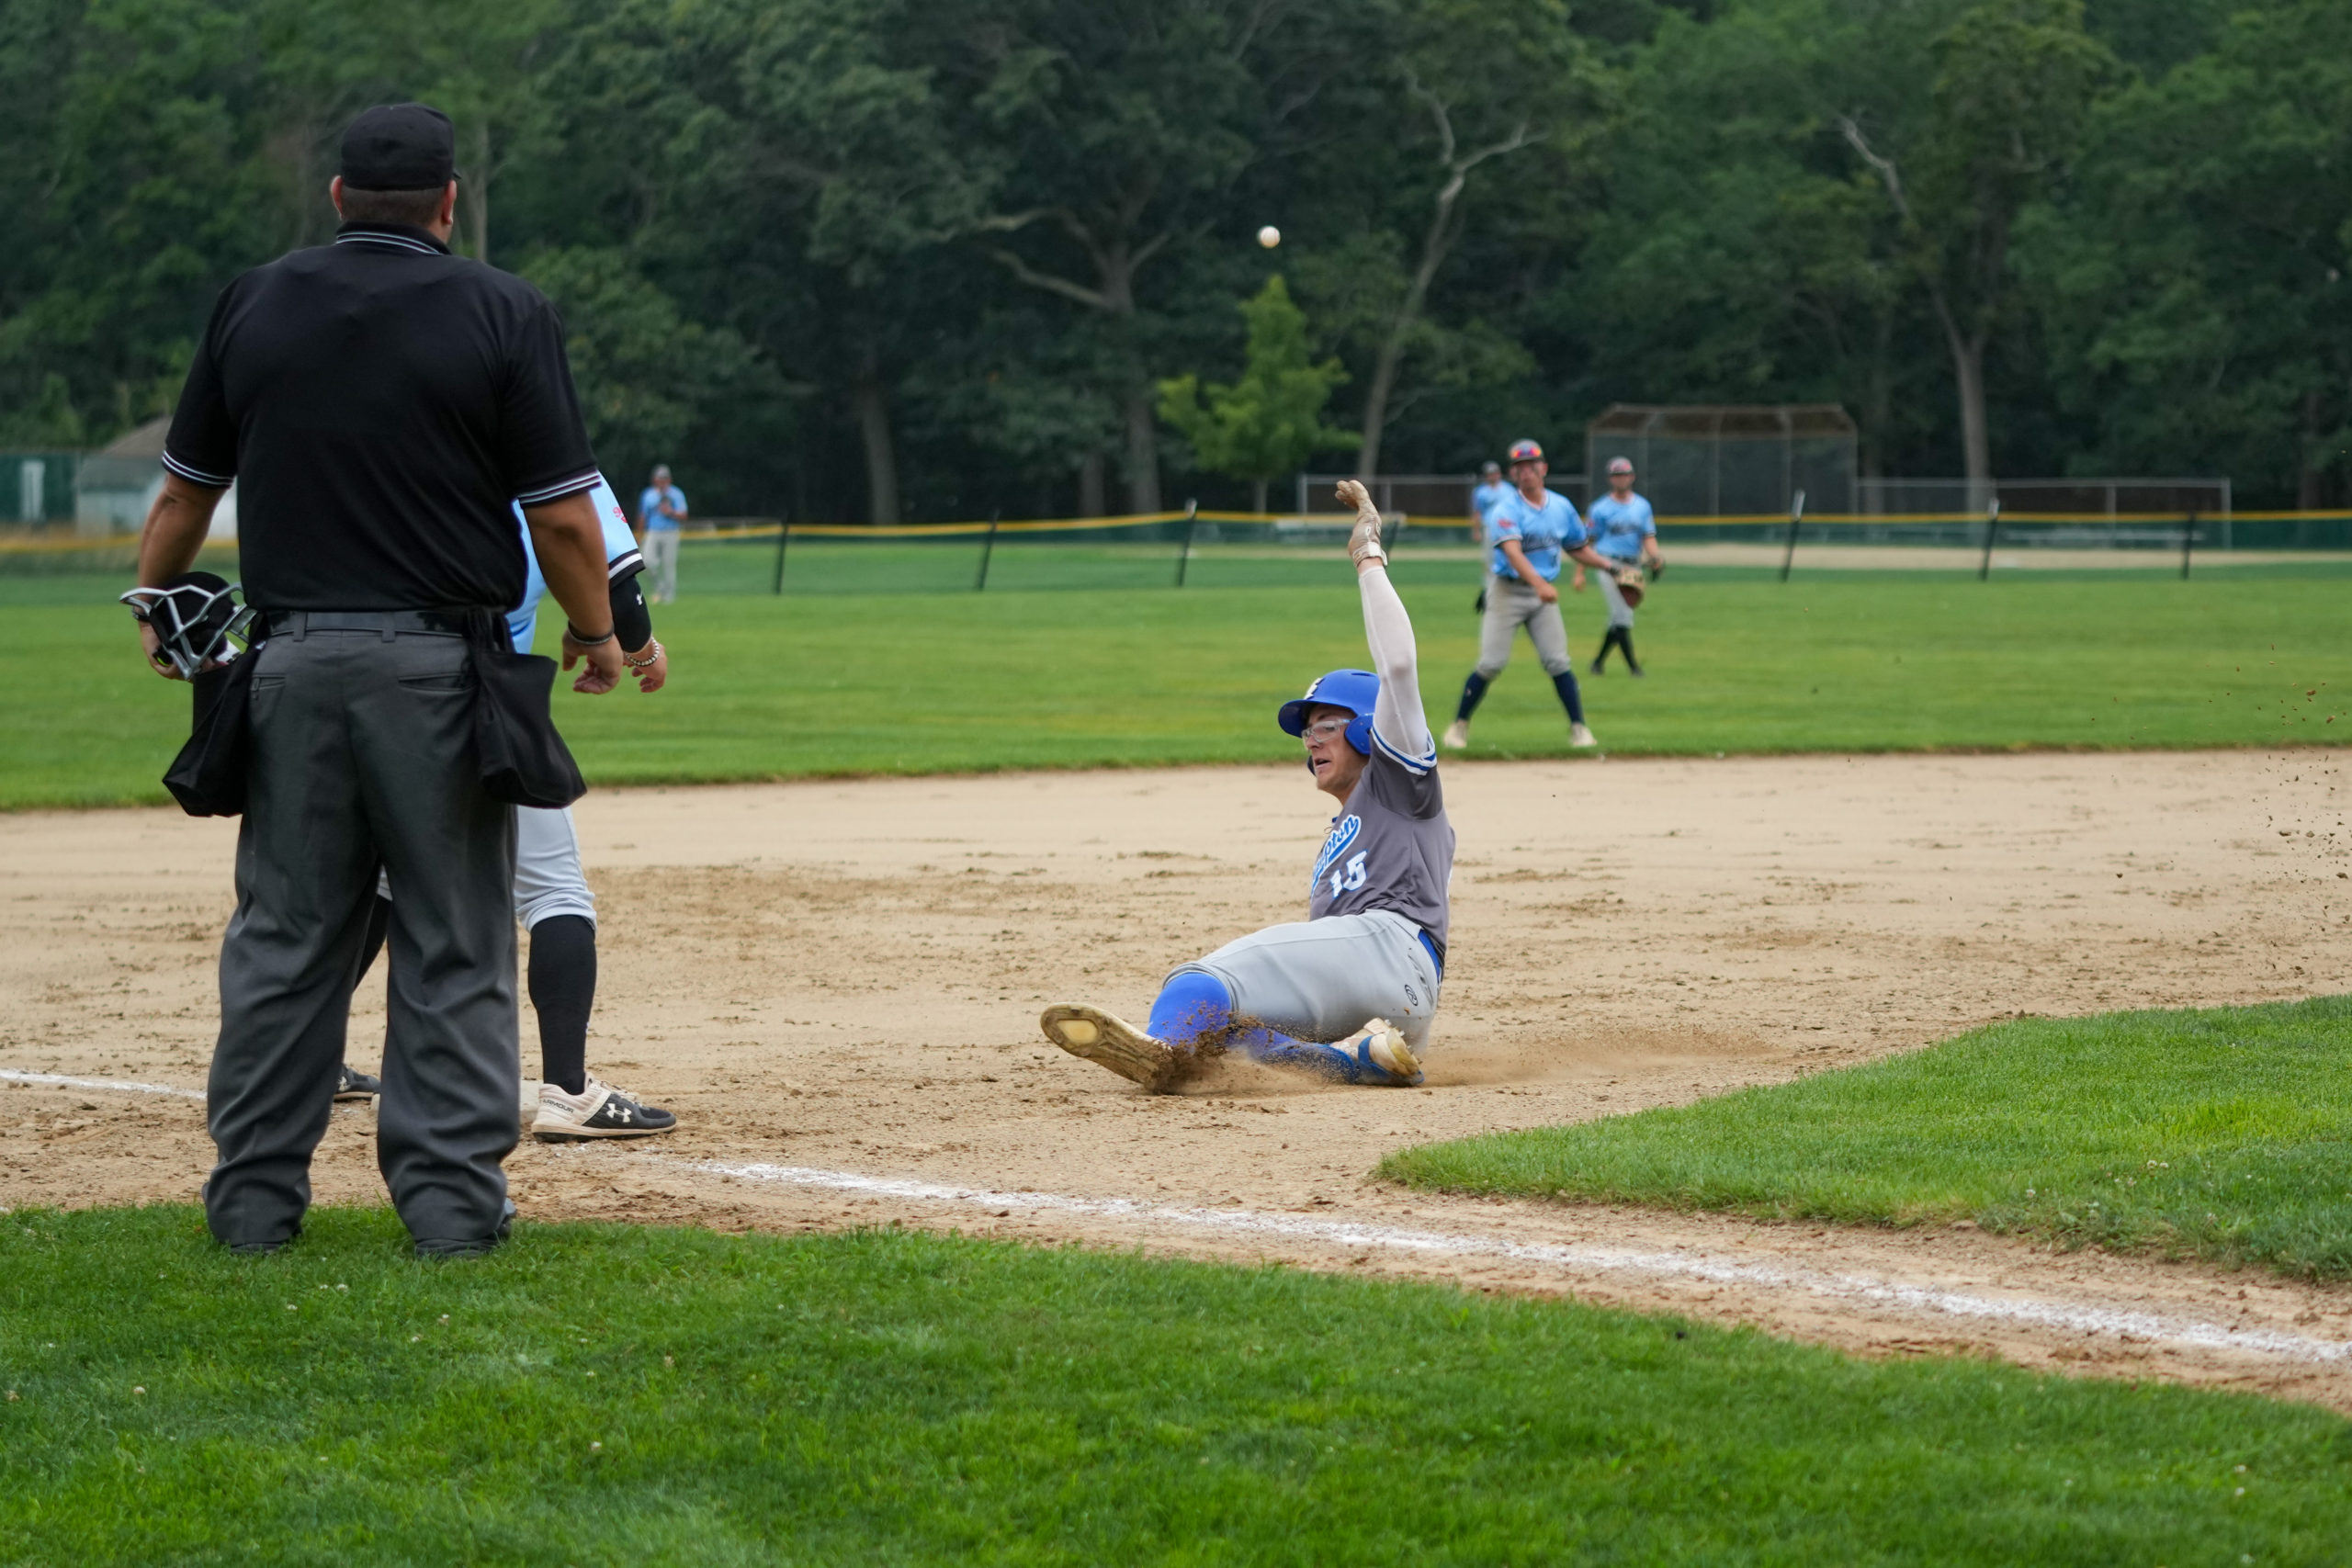 Southampton's Parker Stinson (Indiana State) slides into third base.